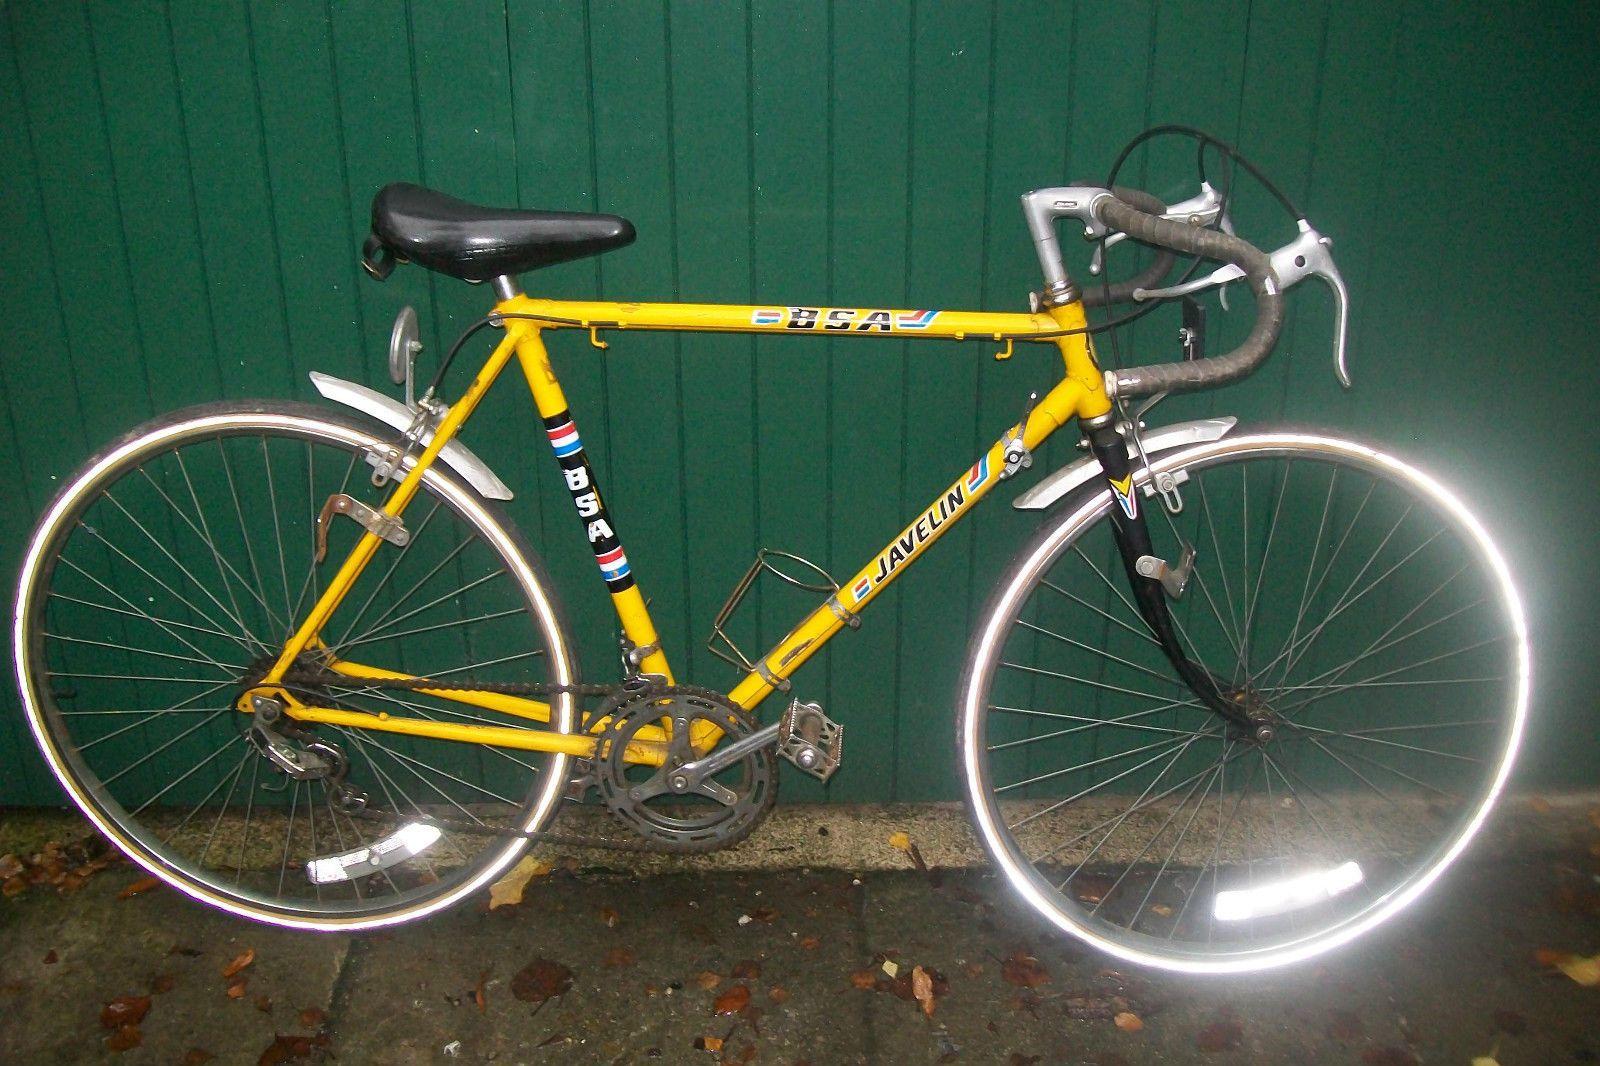 Vintage Retro Bsa Javelin Gents Yellow Racing Touring Bike Unrestored Condition Touring Bike Retro Vintage Touring